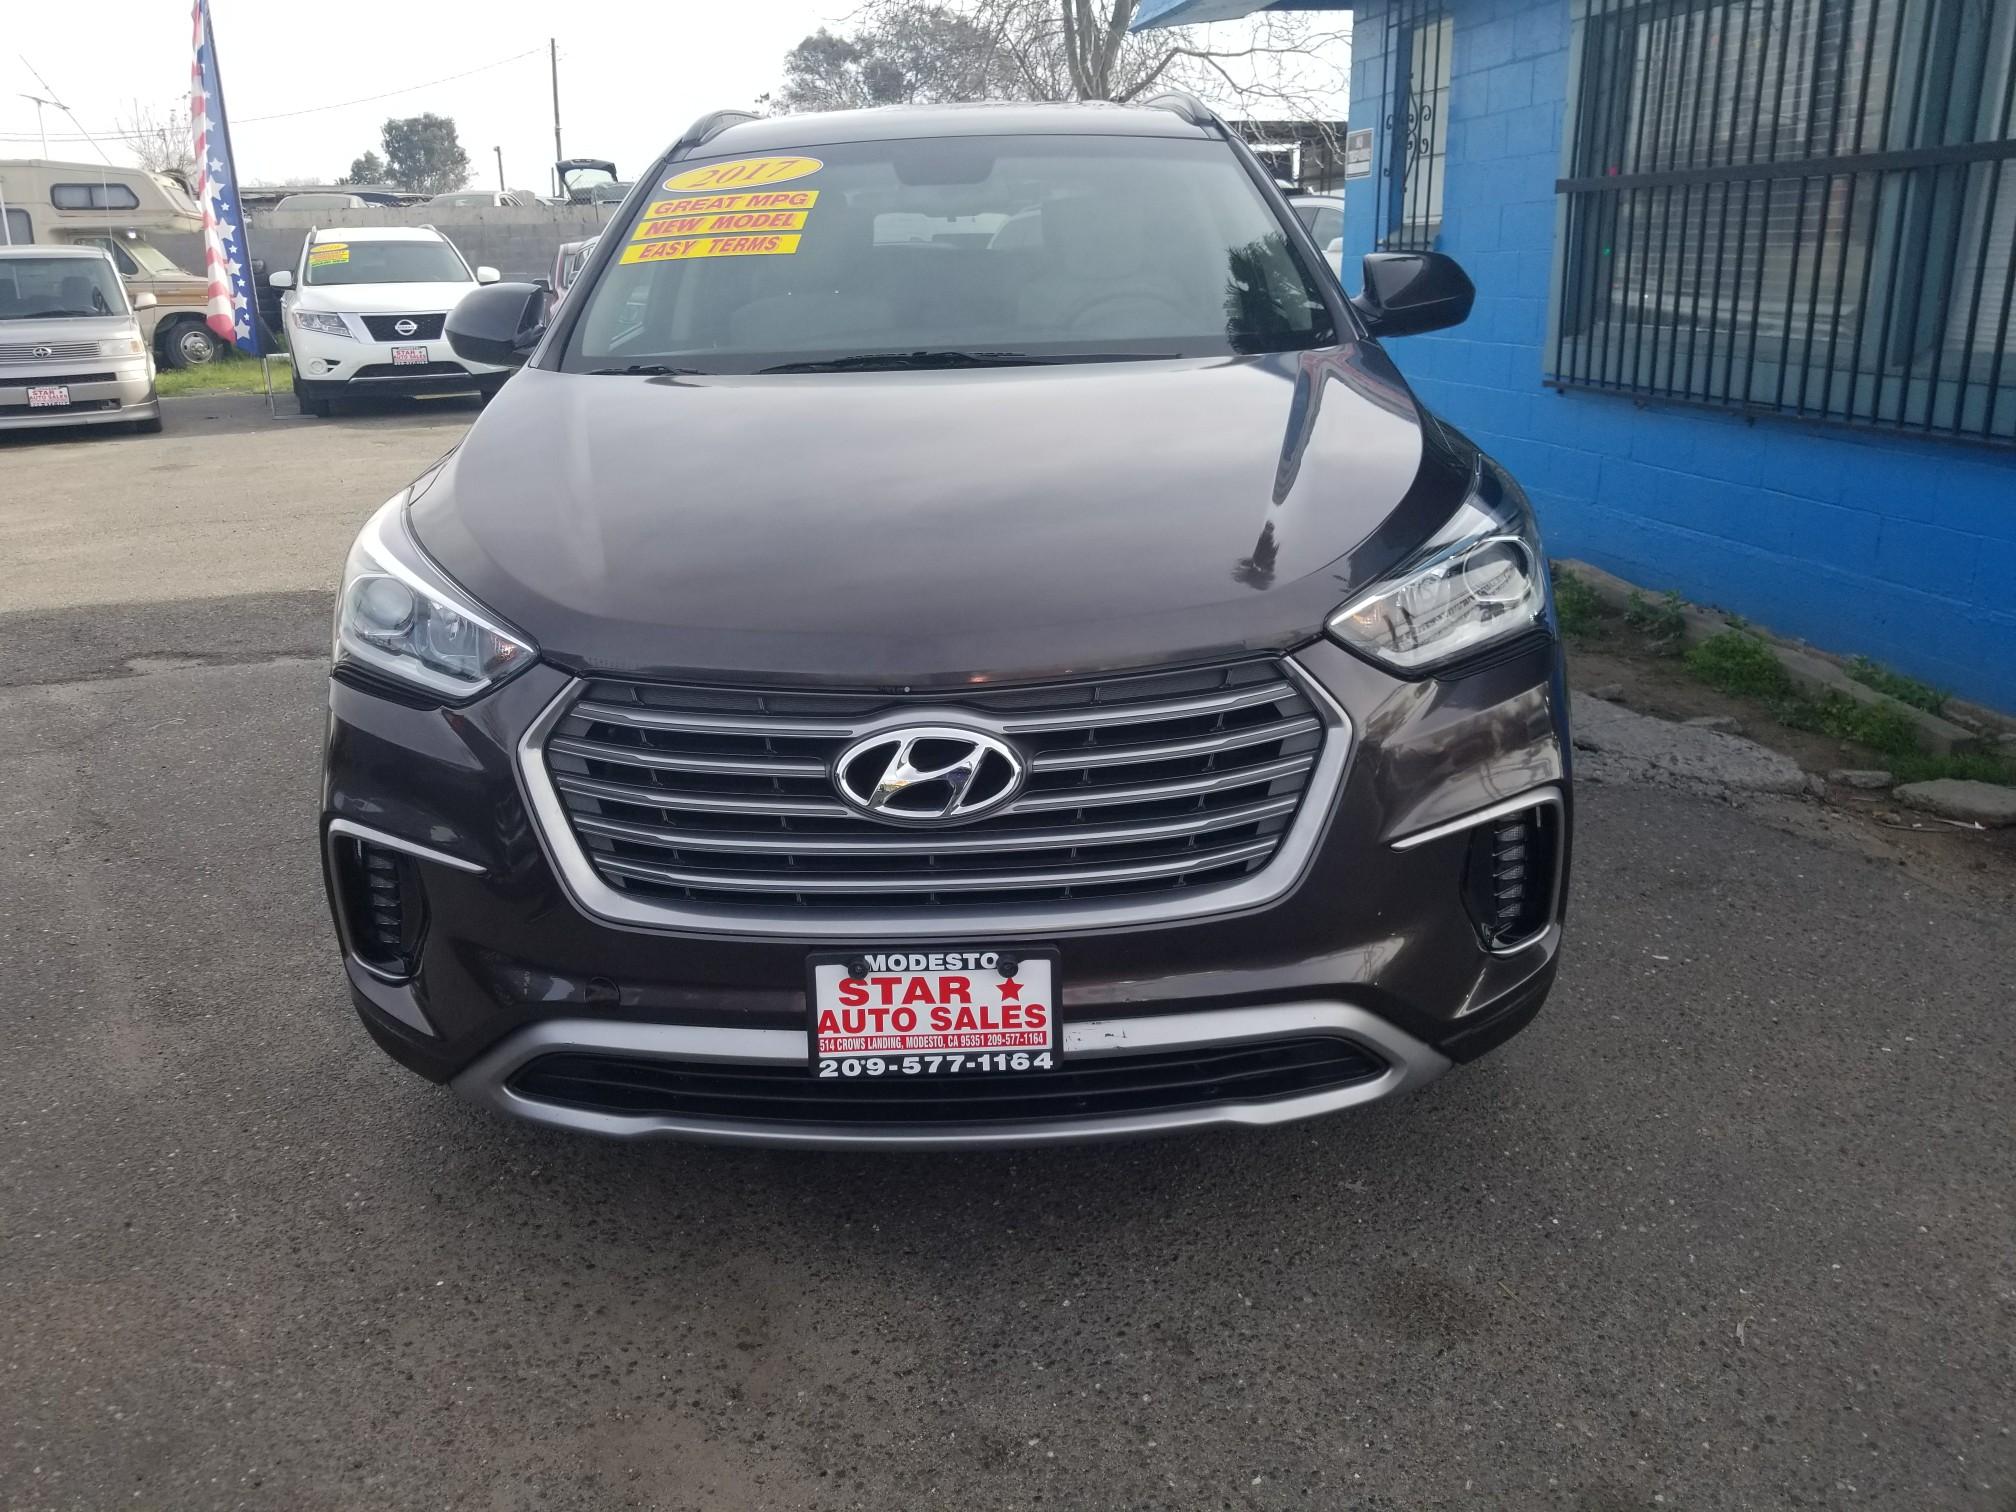 Star Motor Sales >> Star Auto Sales 514 Crows Landing Rd Modesto Ca 95351 Yp Com